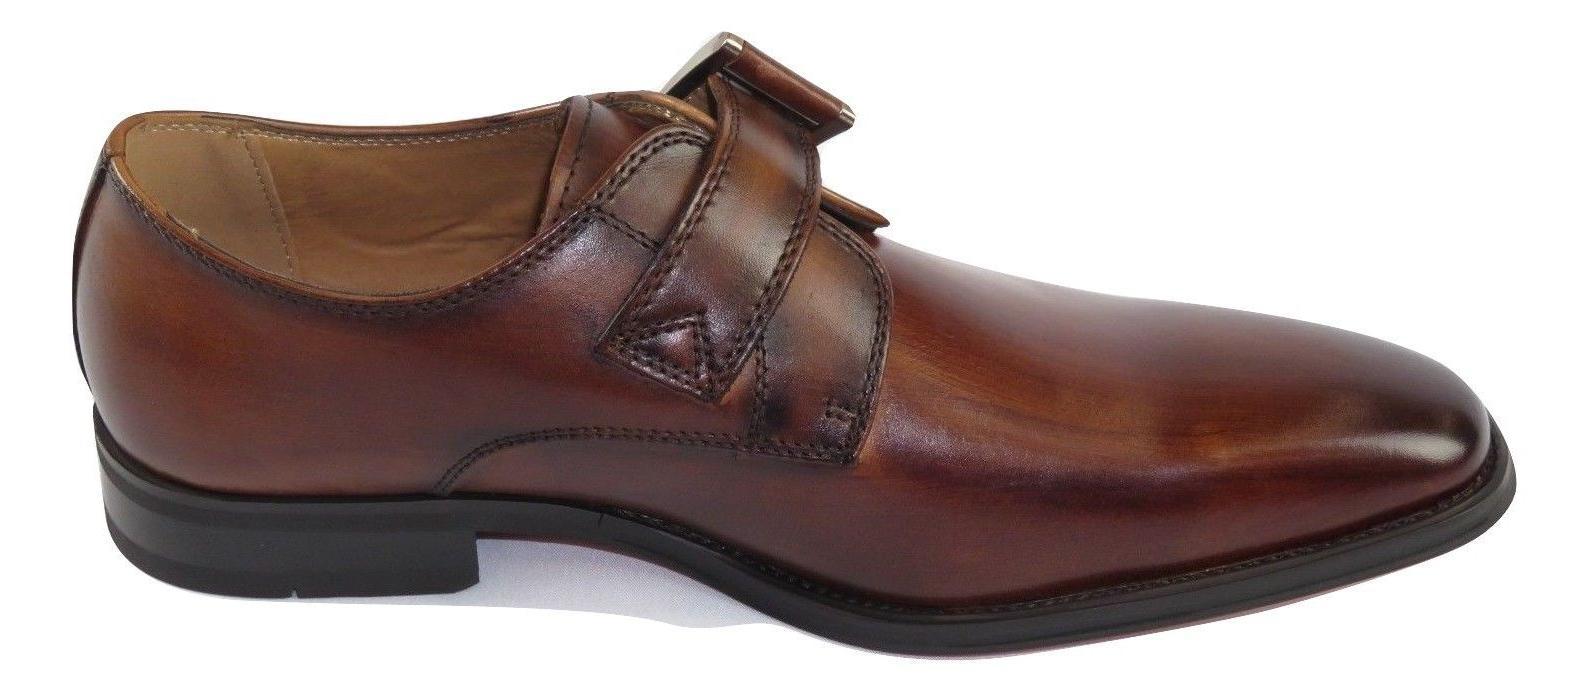 Men Moretti Soft Leather Monk Cognac